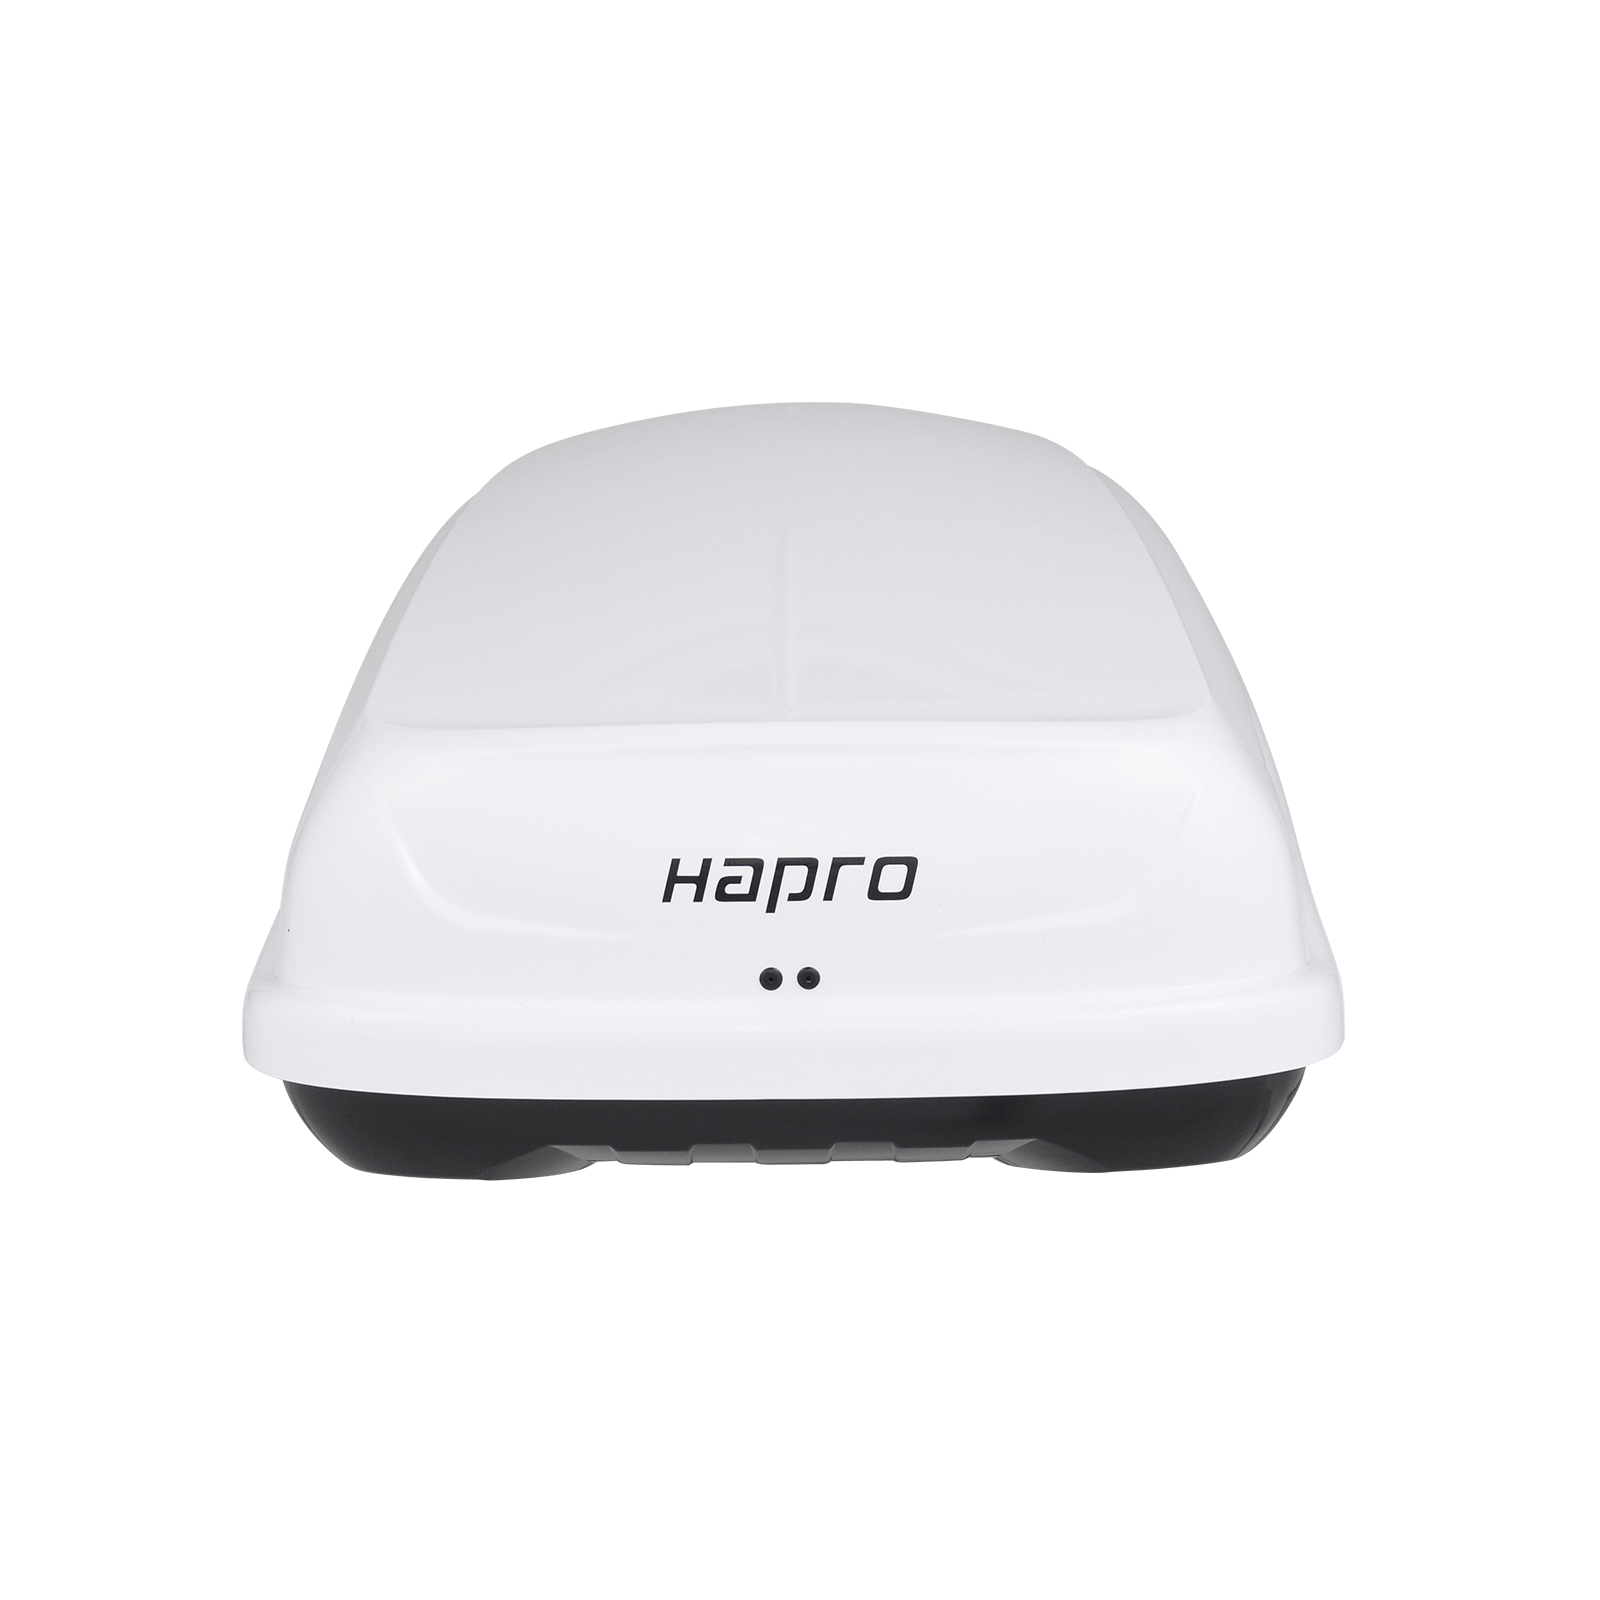 Dachbox Hapro Traxer 6.6 weiß - Bild 4